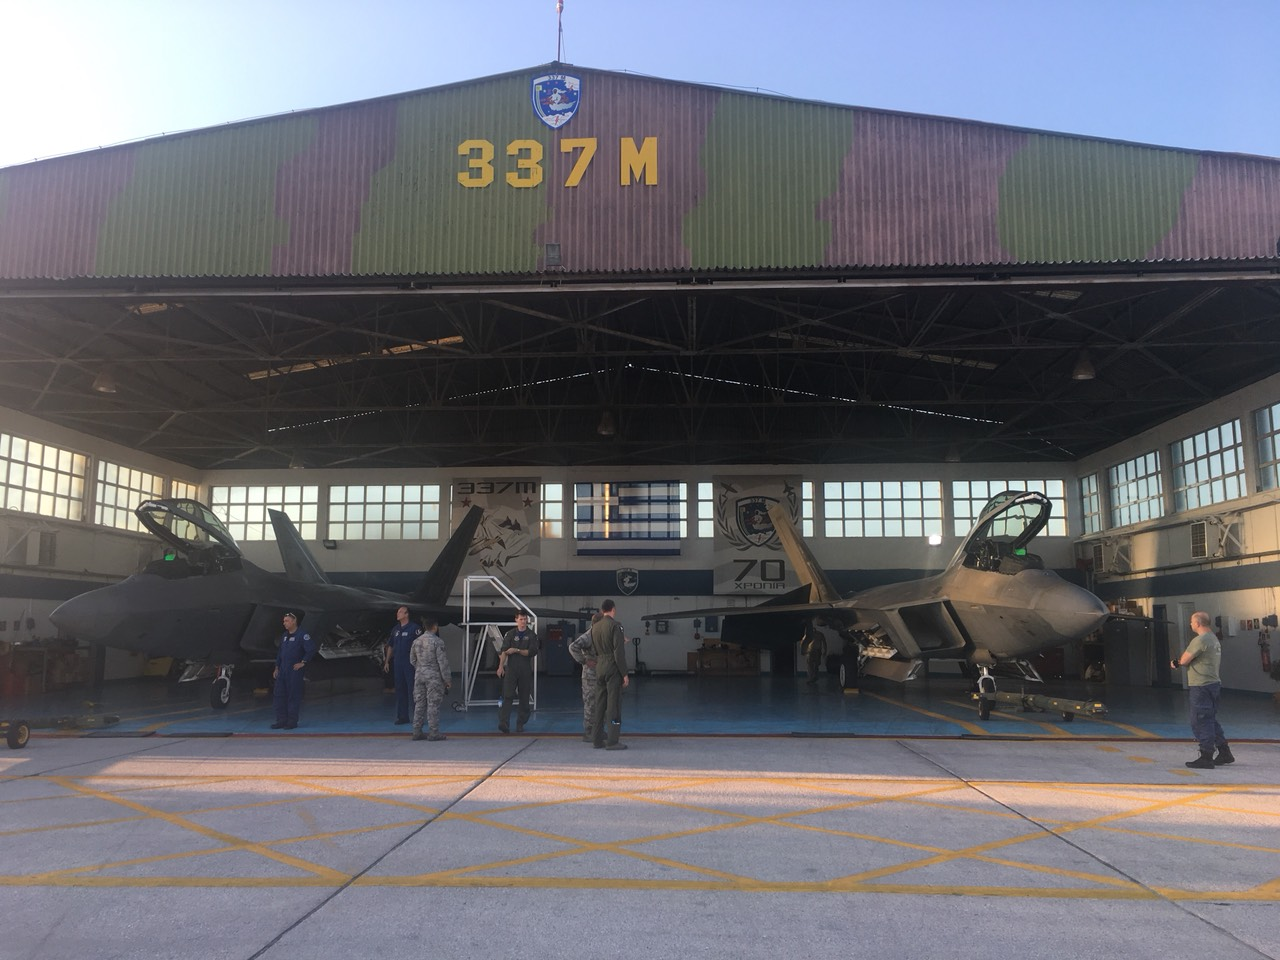 amerikanika-f-22-raptor-sti-aeroporiki-vasi-tis-larisas5